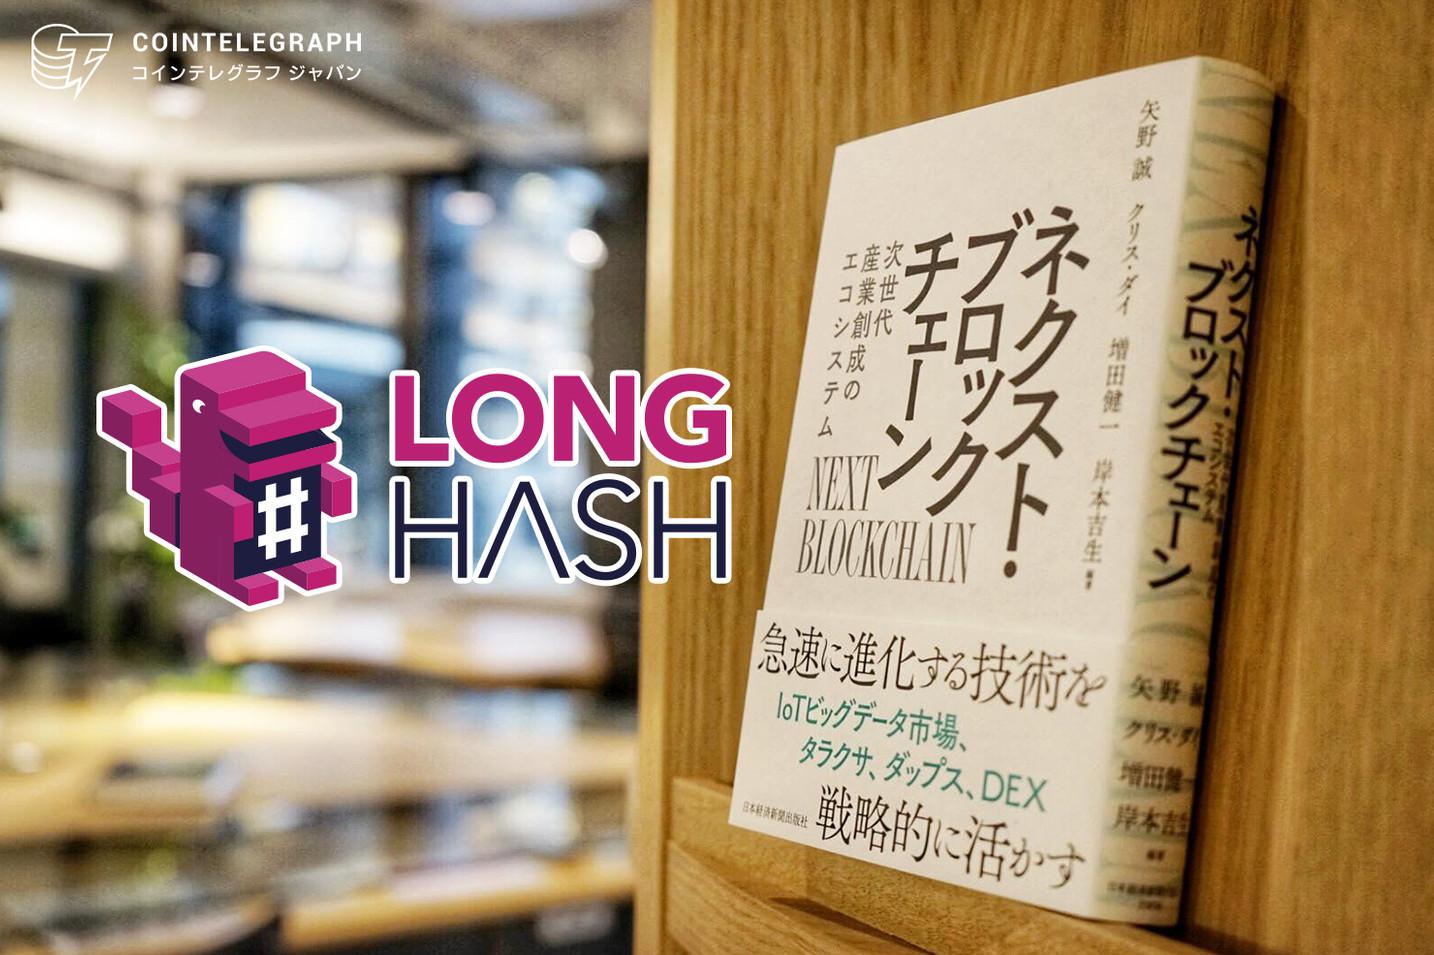 LONGHASH代表取締役と経済産業研究所所長他との共著『ネクスト・ブロックチェーン』が発売ー本書関連イベントが開催